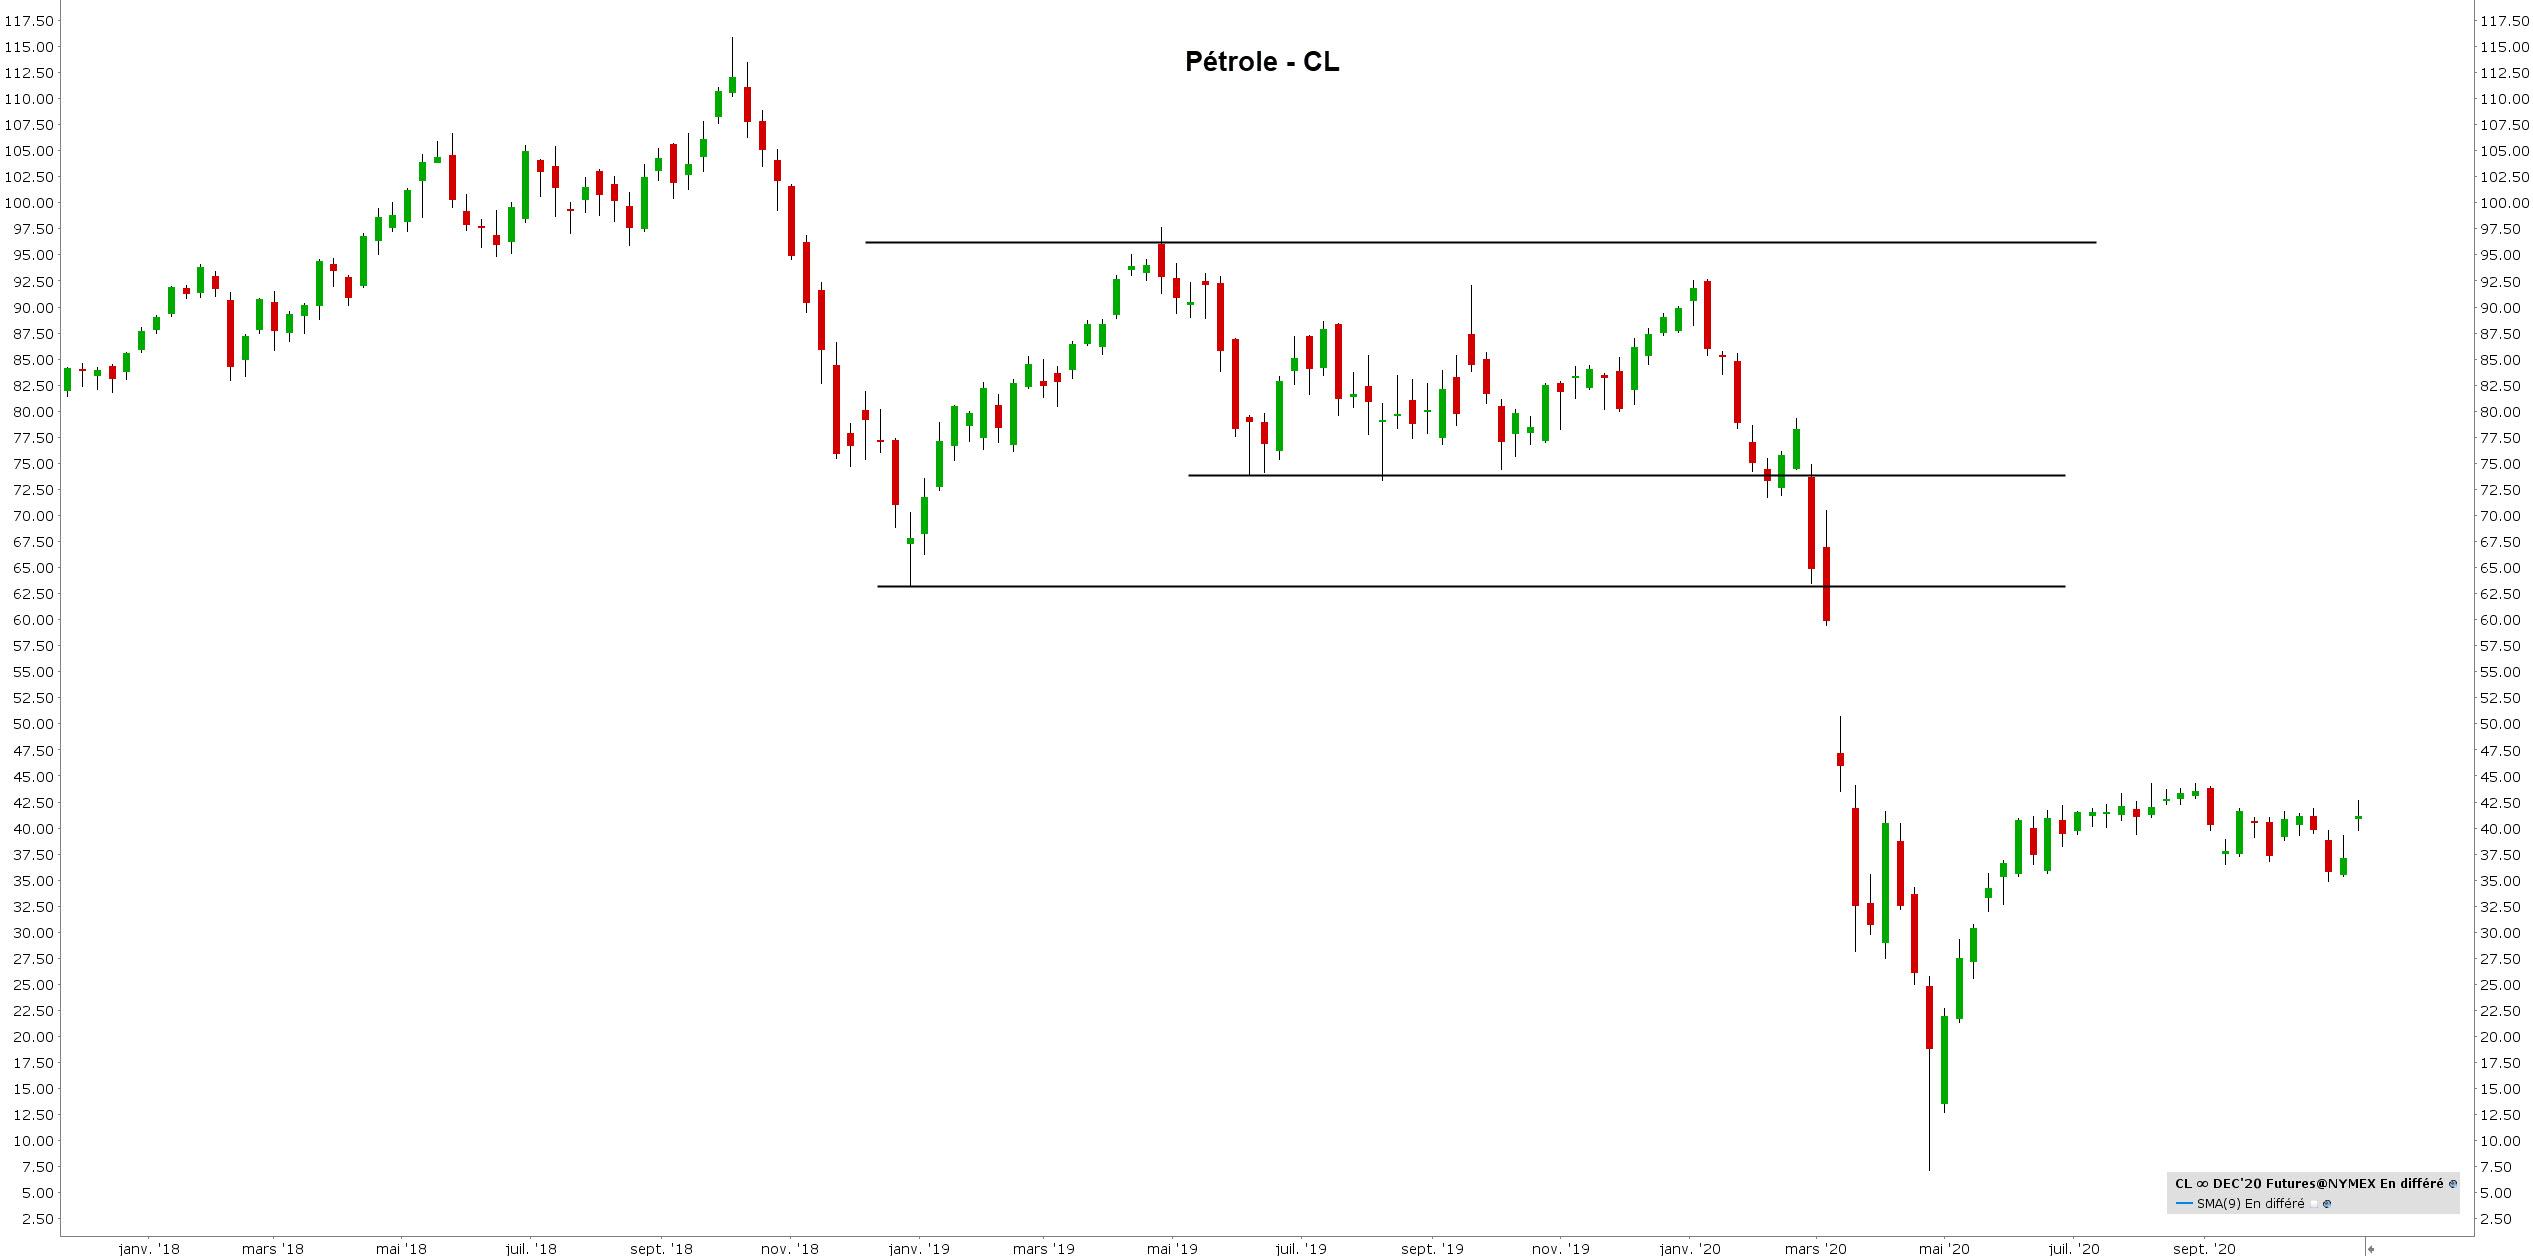 correlation trading - correlation bourse - pétrole cl